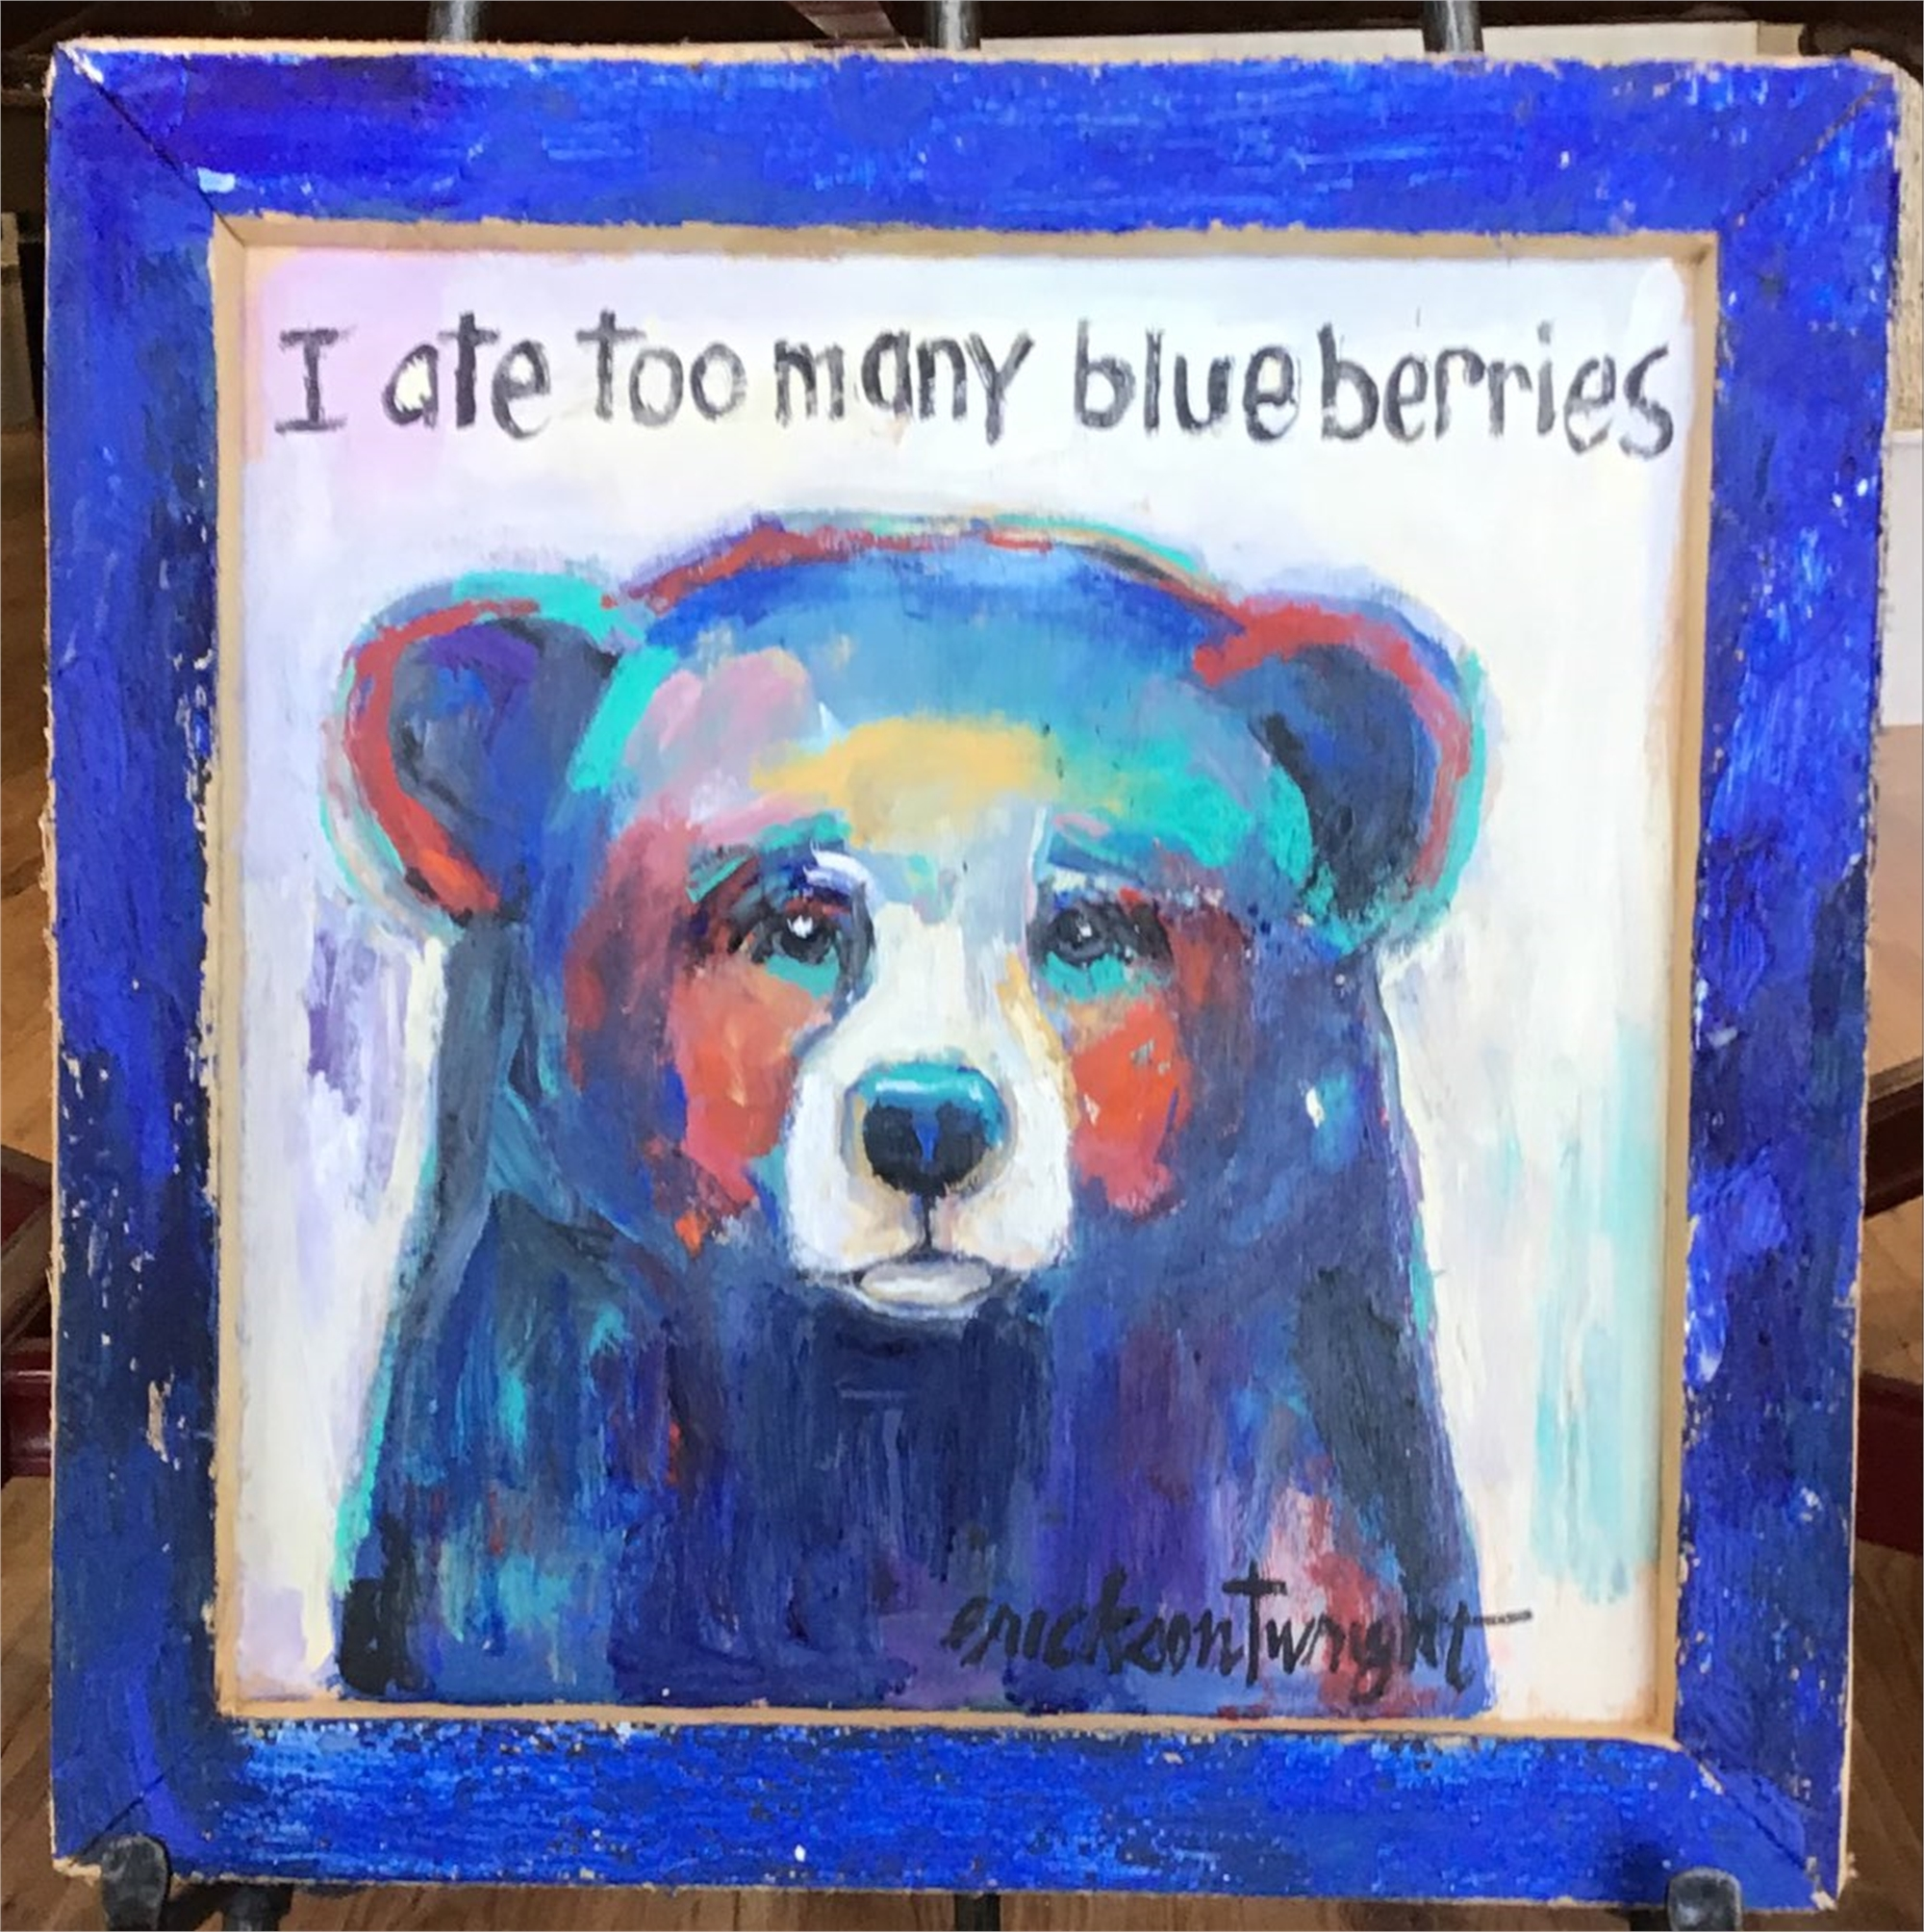 Blueberries 2 by Sandra Erickson Wright